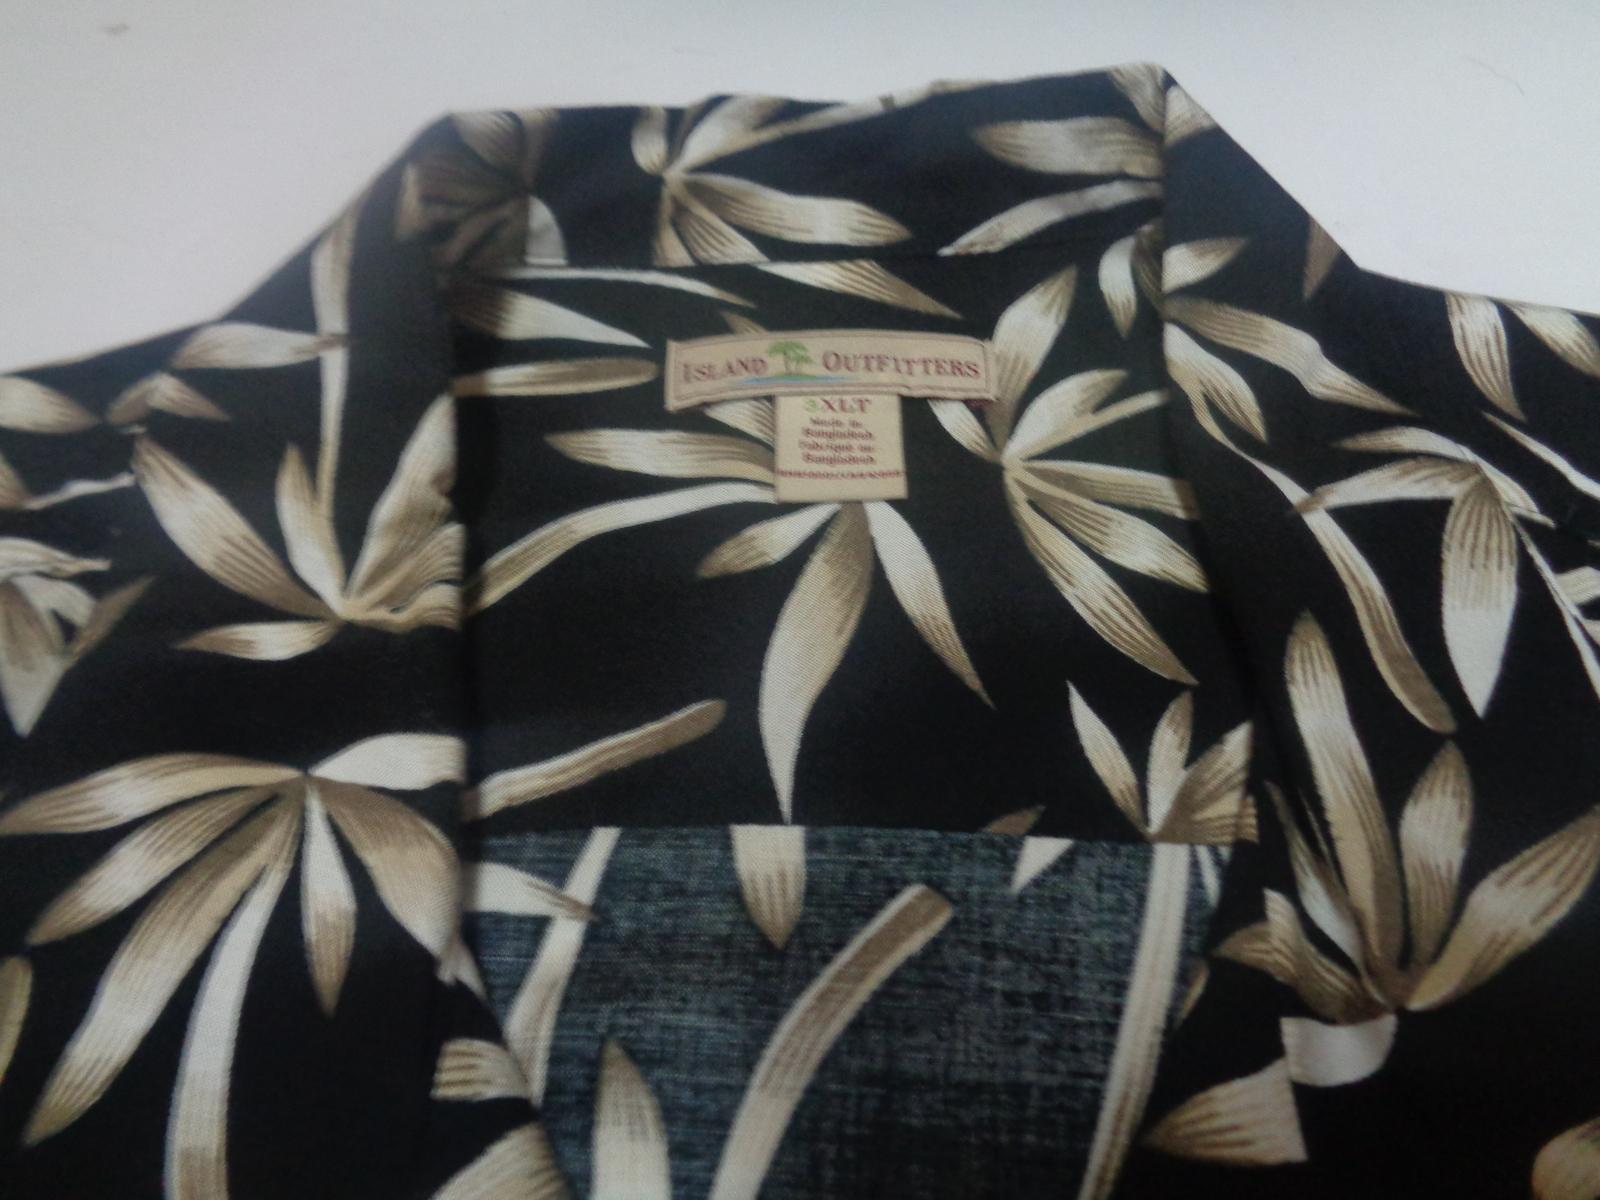 Men's Island Outfitters Hawaii Casual Shirt NWOT Sz XLT Black Palm Tree Pattern